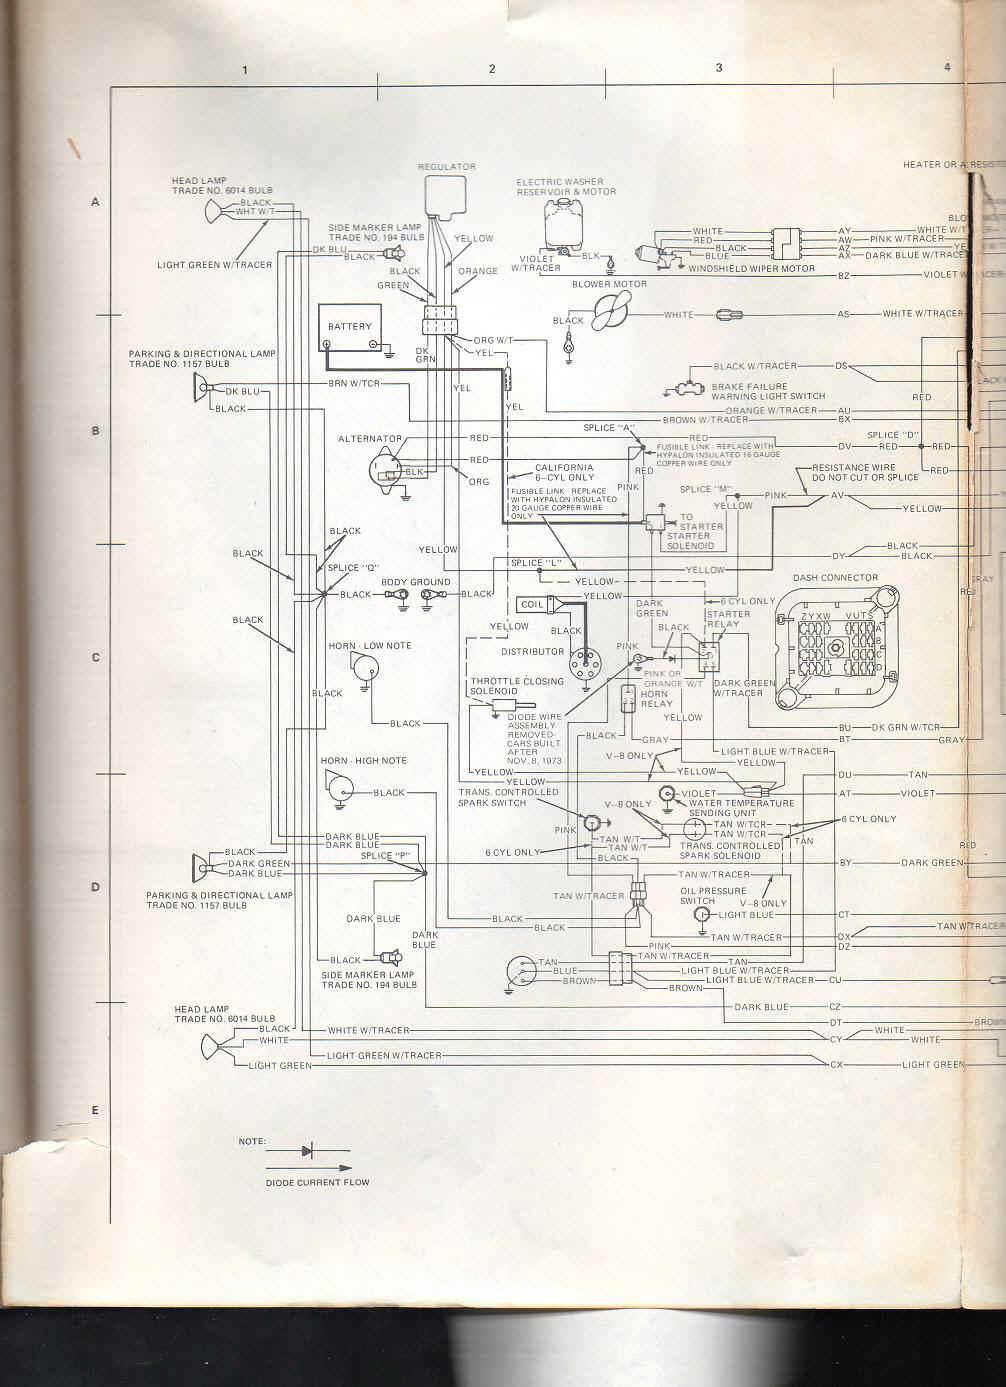 Amc Amx Wiring Diagram Expert Diagrams Msd 6al 2 1974 Drawing Mitsubishi Starion 1972 Javelin Schema